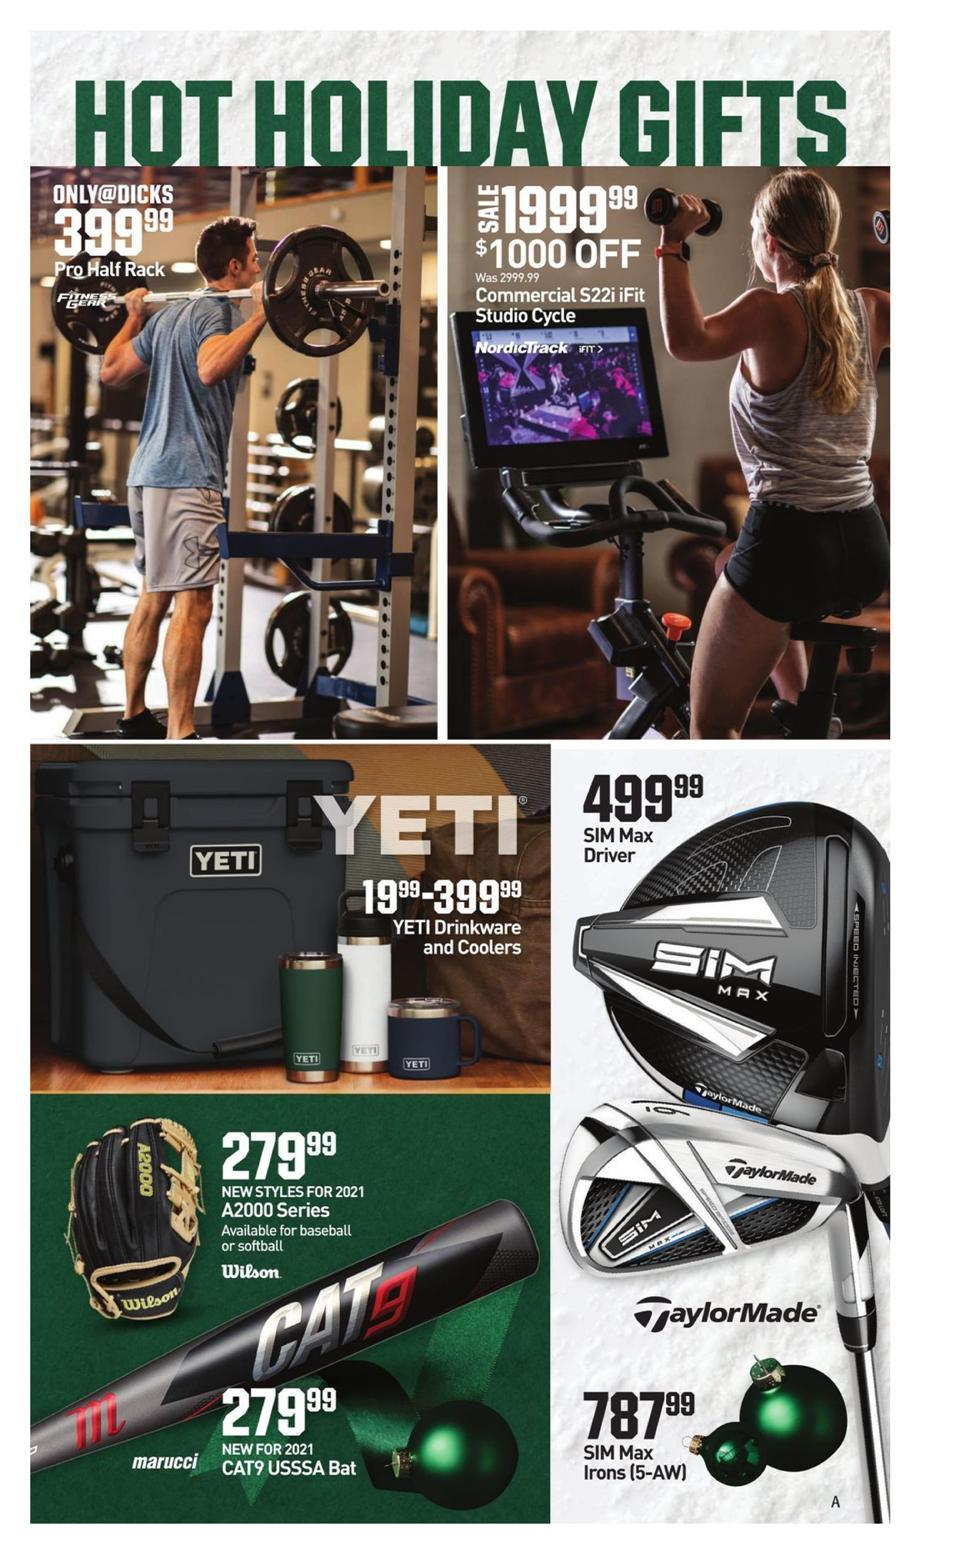 Dicks Sporting Goods Black Friday 2020 Ad